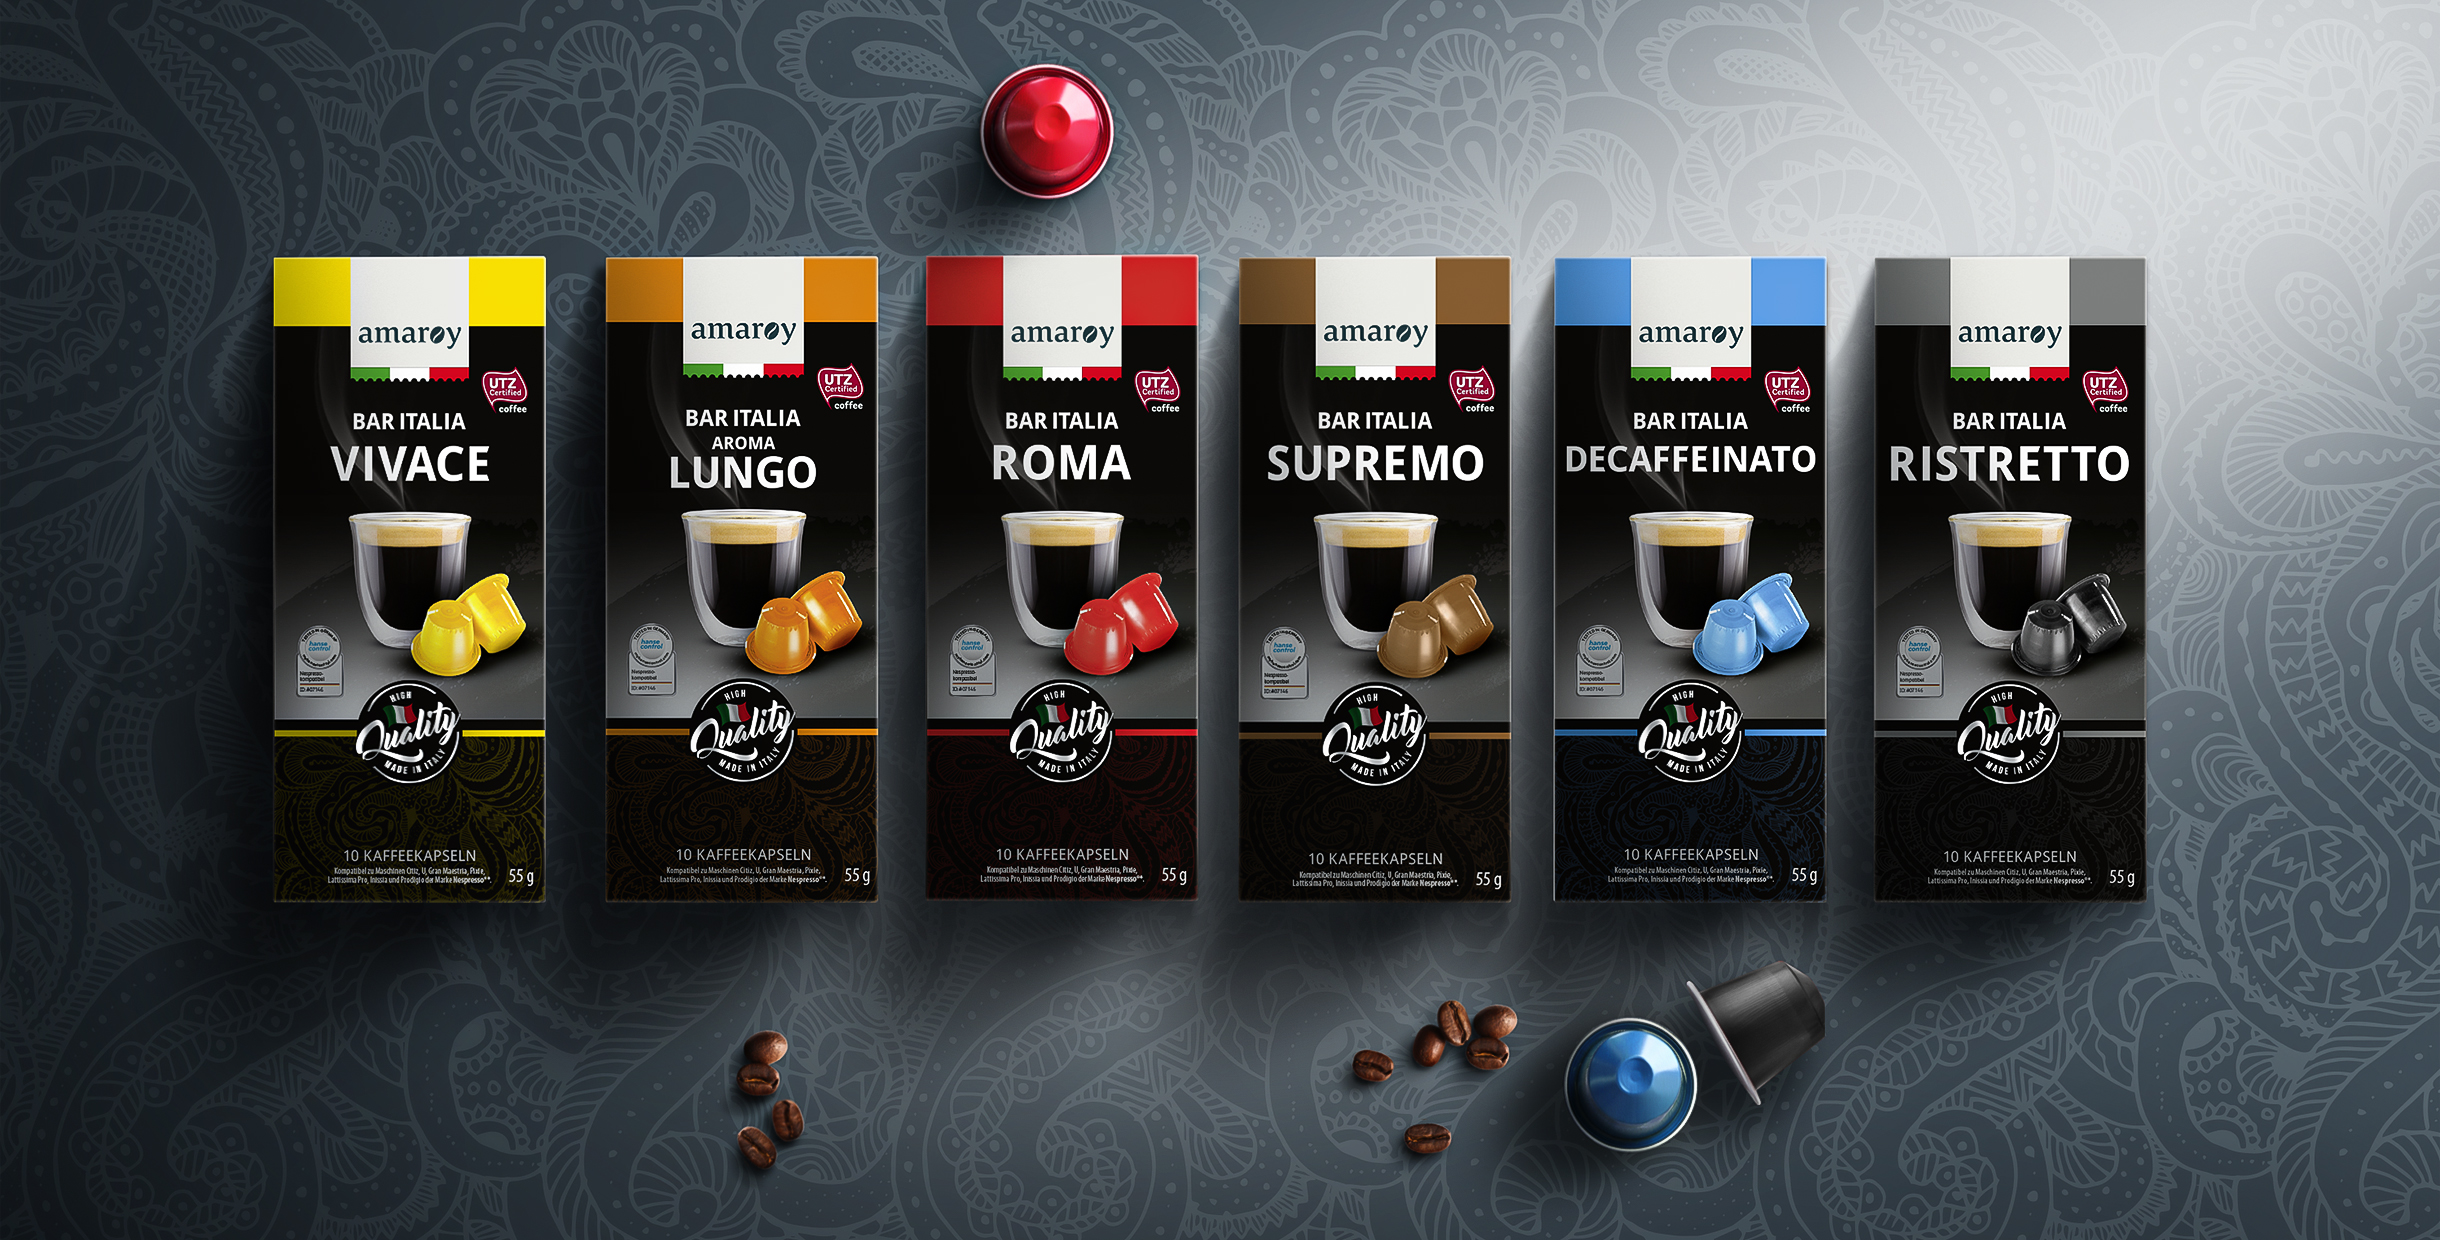 hofer amaroy kapseln espresso packaging design rubicon